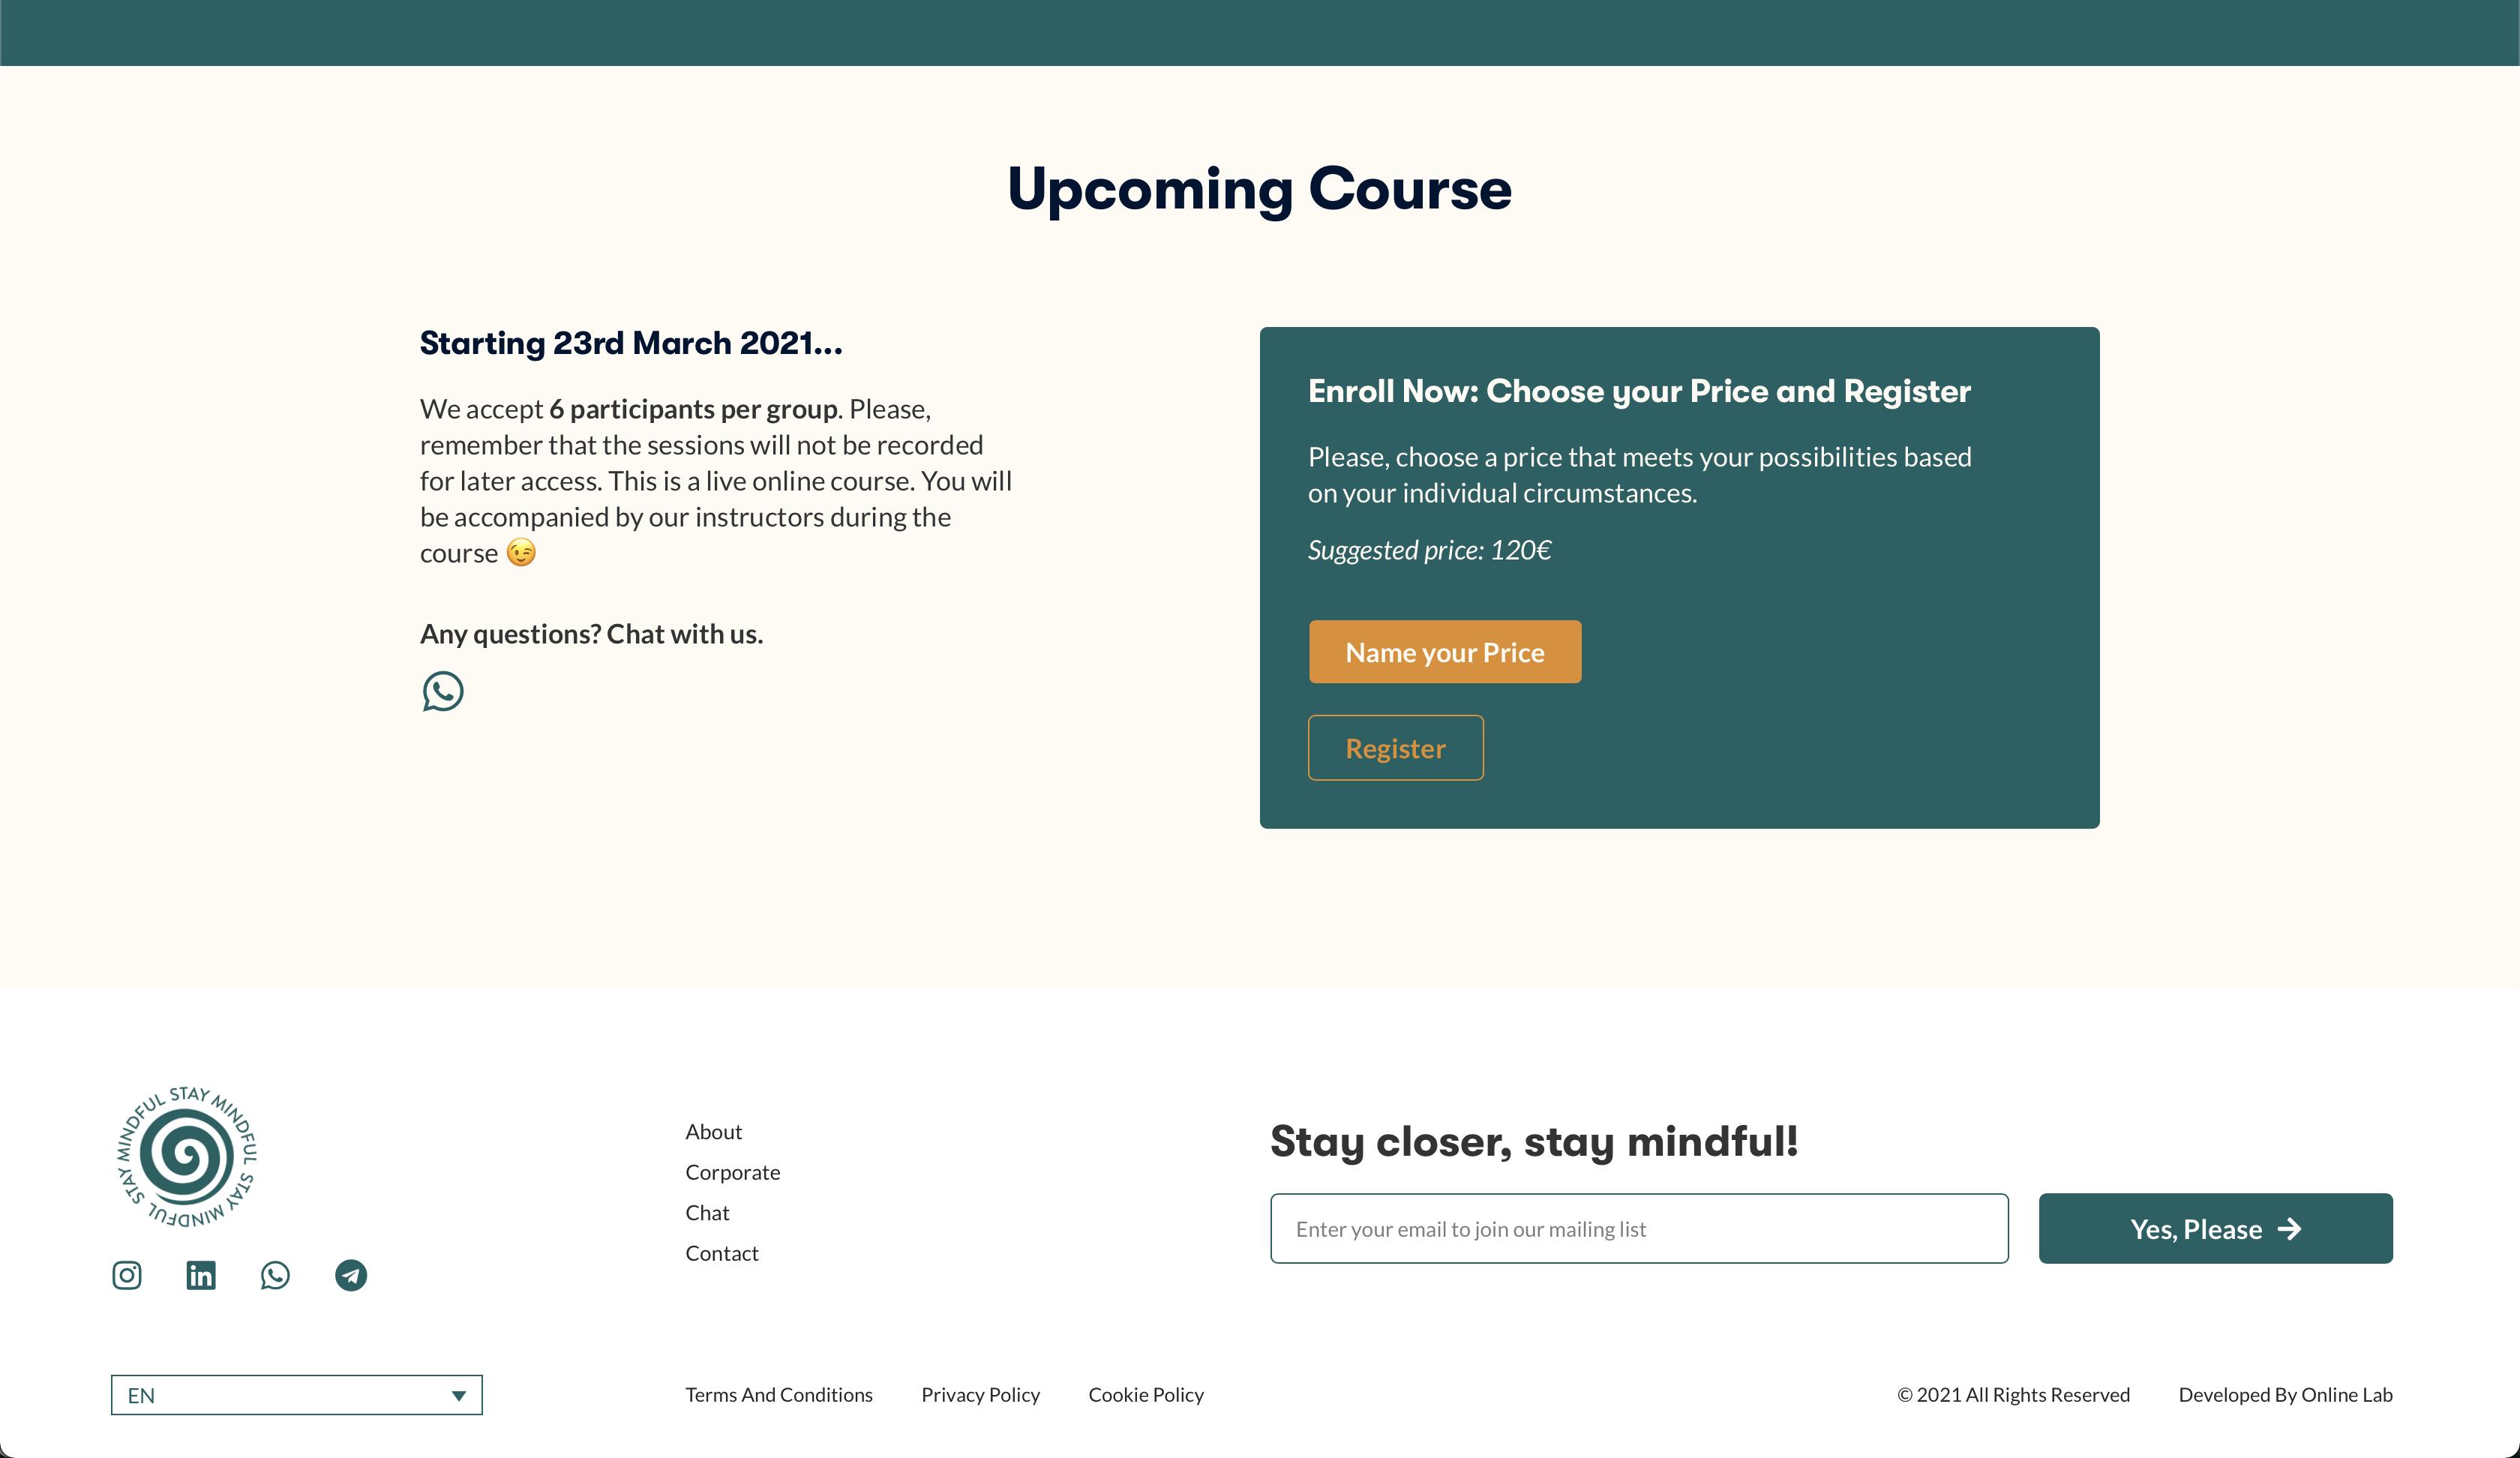 stay-mindful-online-lab-web-development-web-design-7